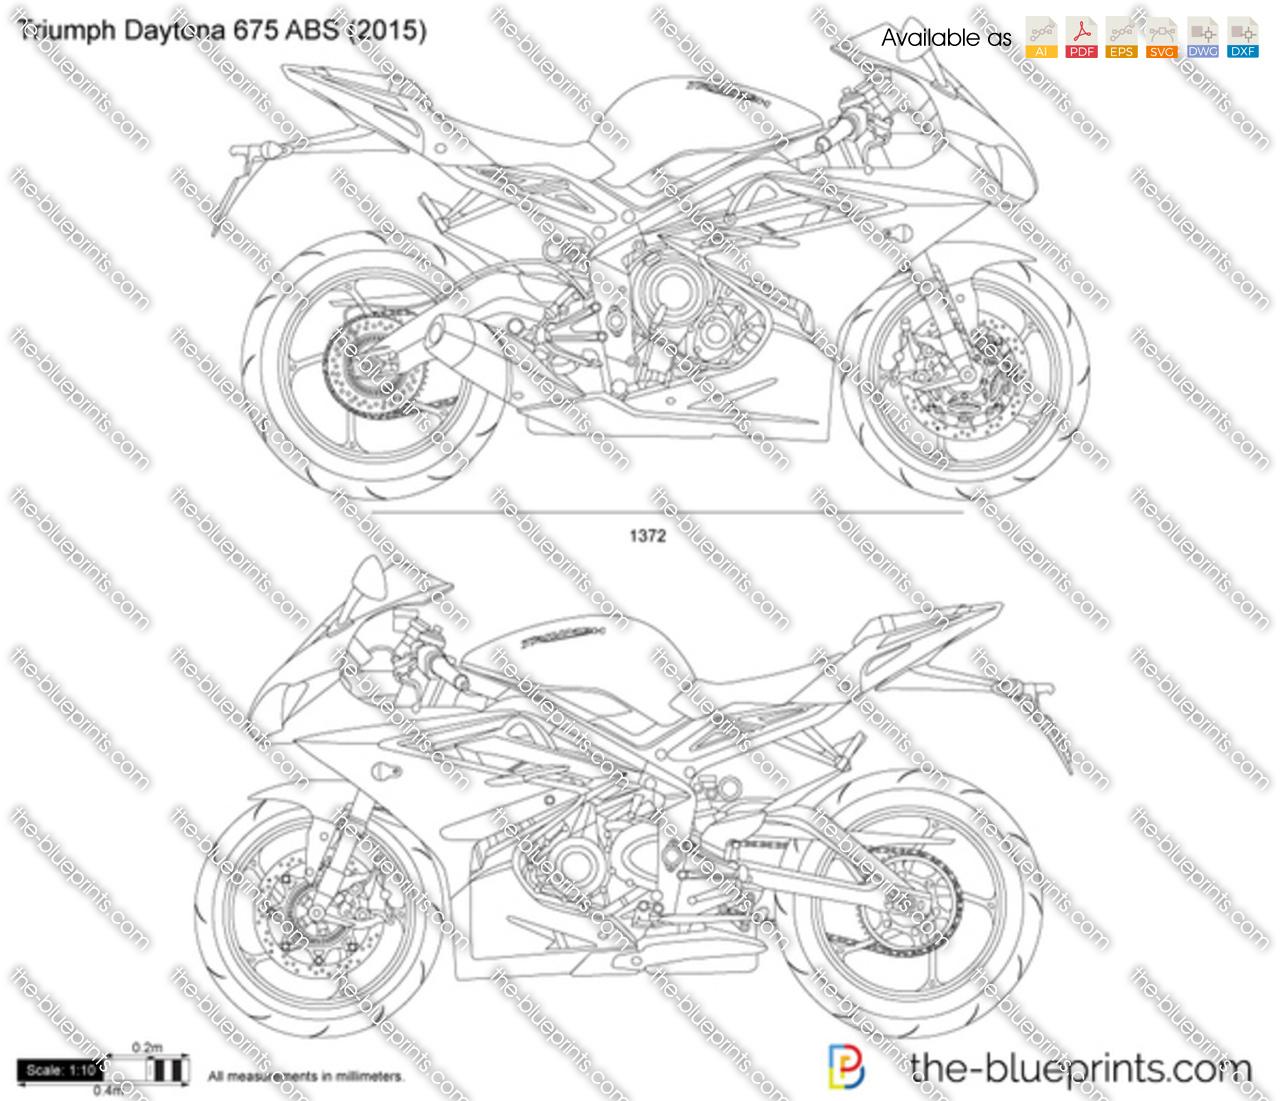 Triumph Daytona 675 ABS vector drawing